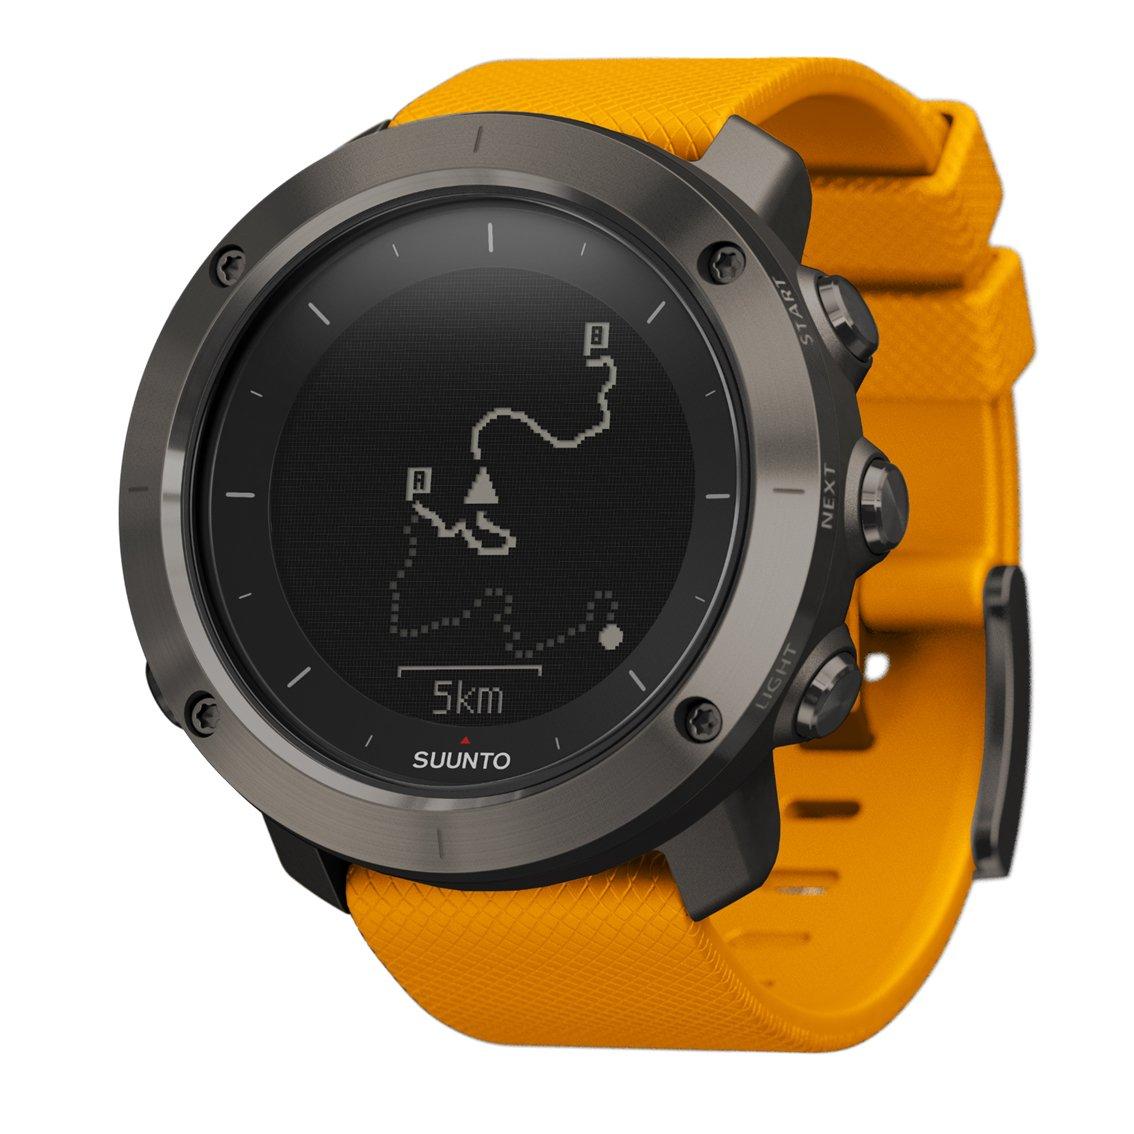 SUUNTO TRAVERSE (スント トラバース) スマートウォッチ GPS 登山 気圧計 [日本正規品] B016RJB8NK アンバー アンバー